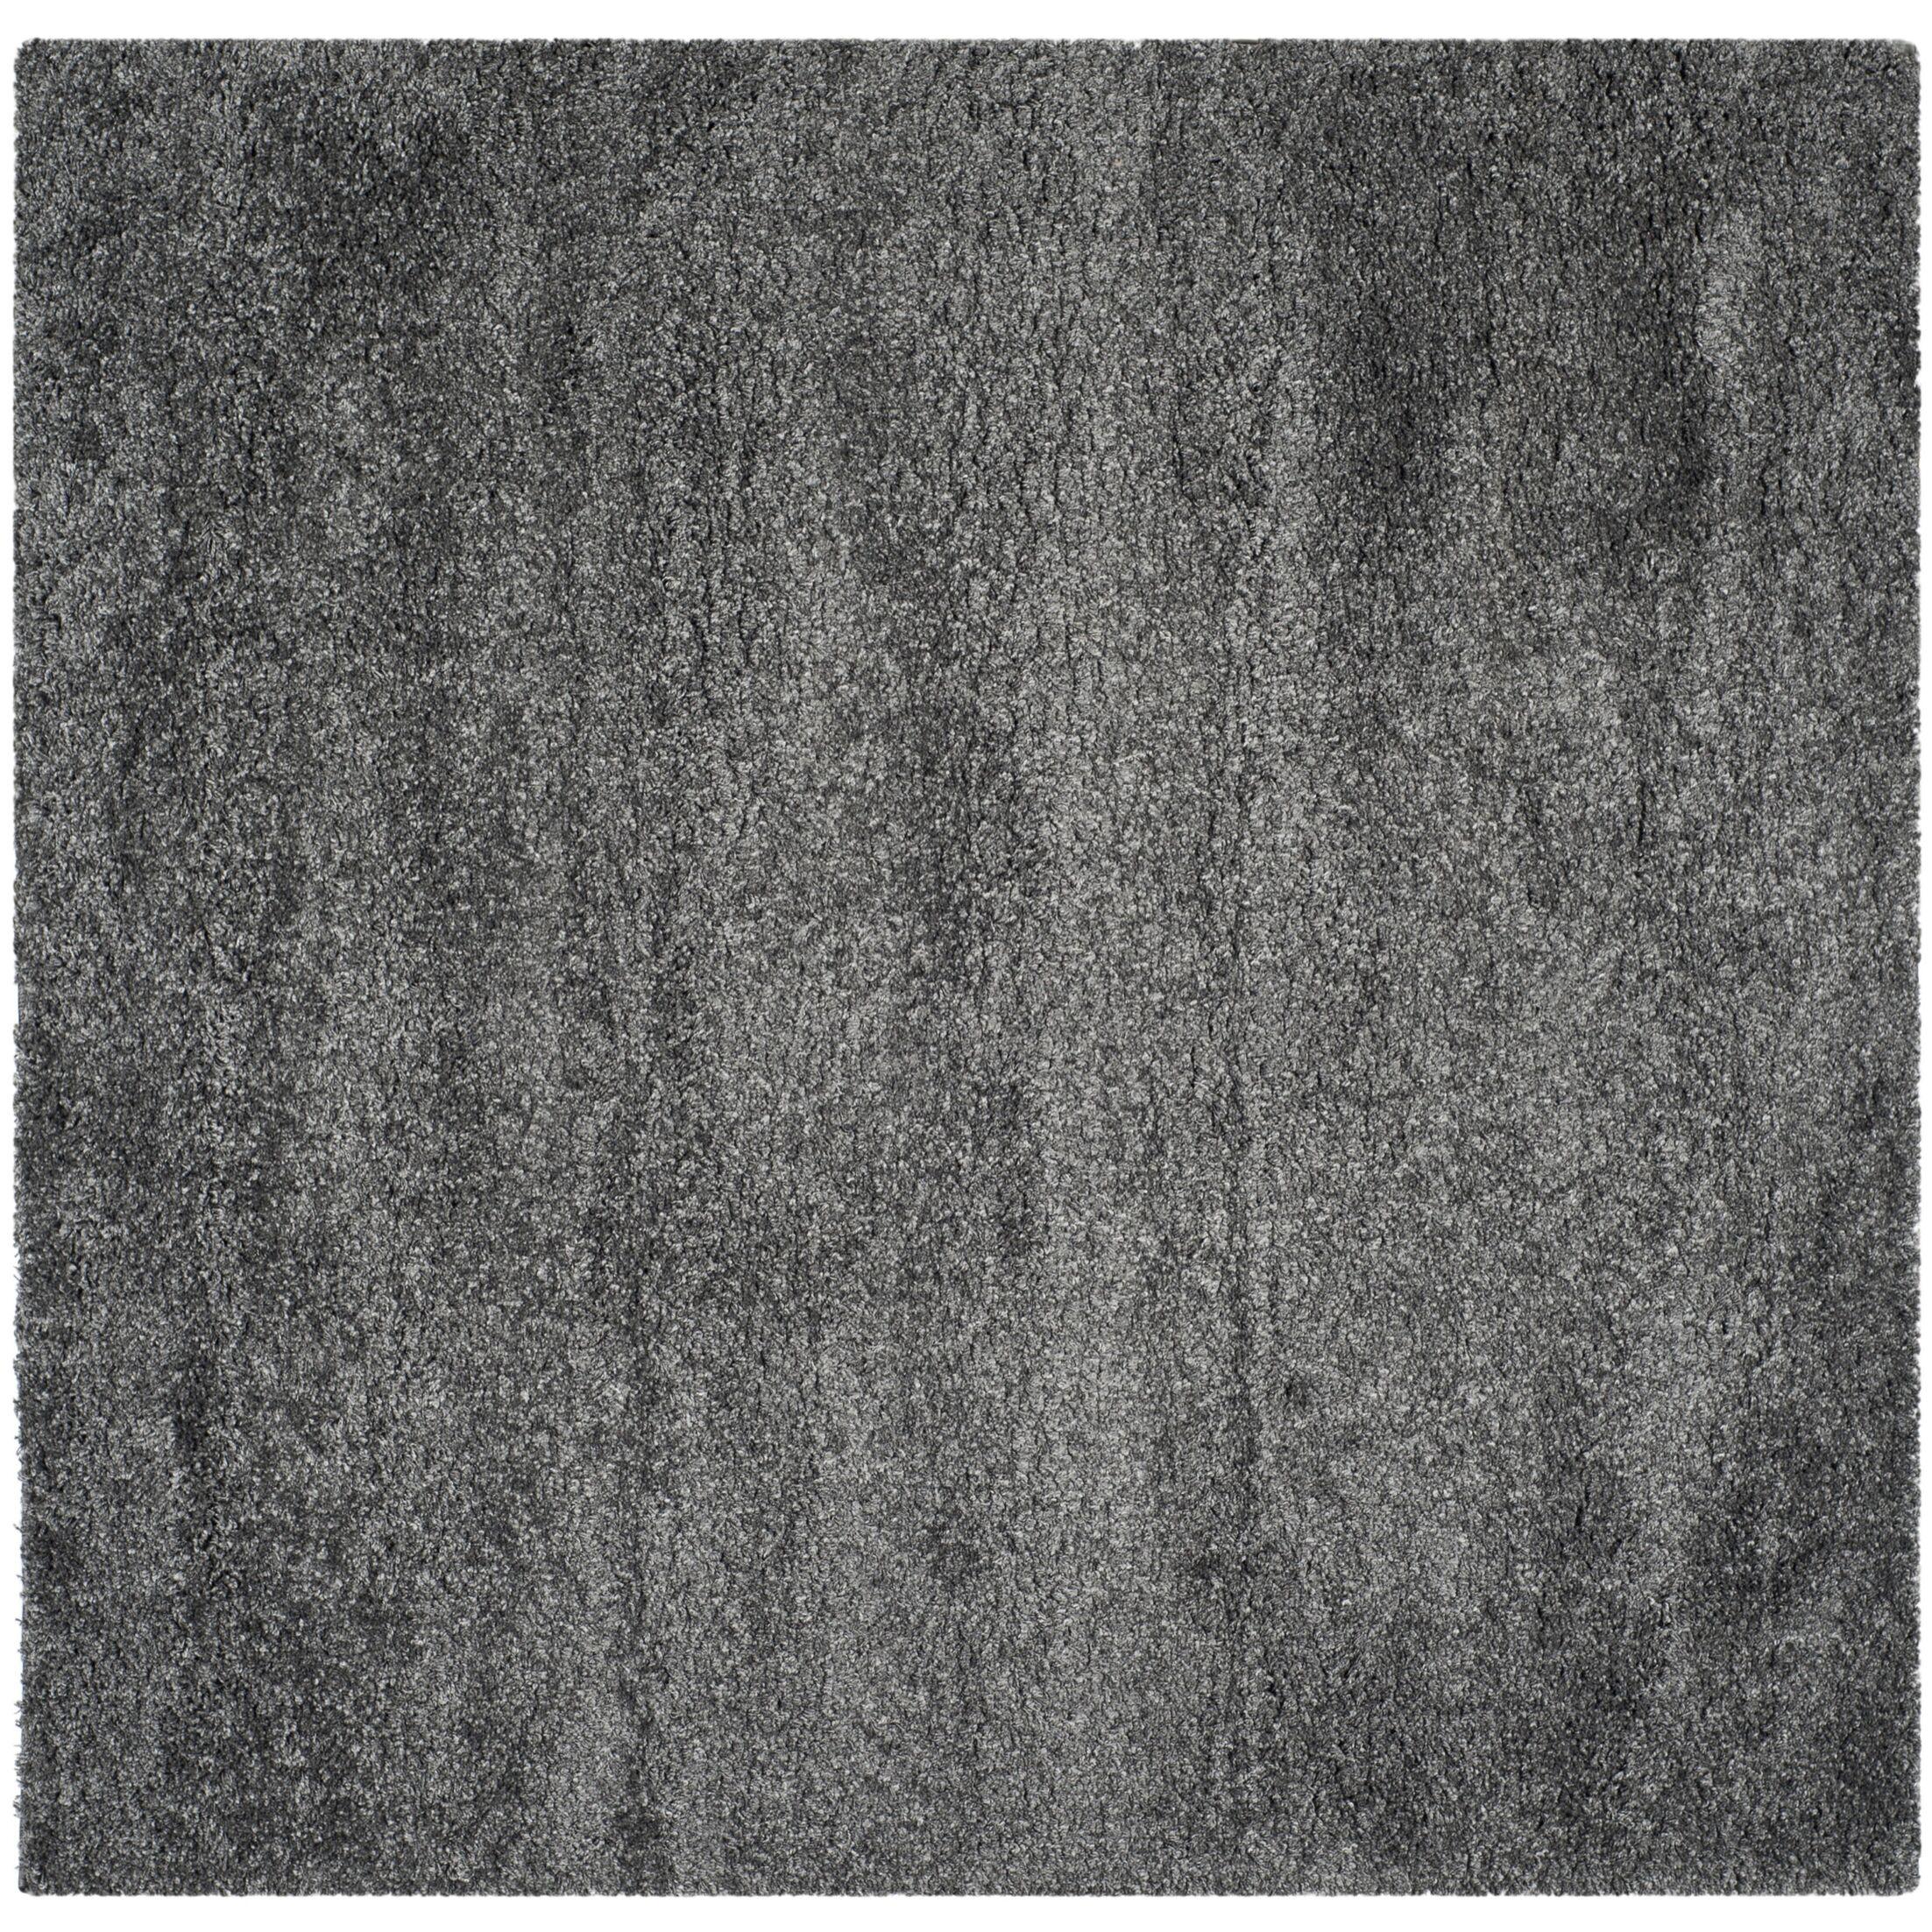 Maya Handmade Dark Gray Area Rug Rug Size: Square 8'6